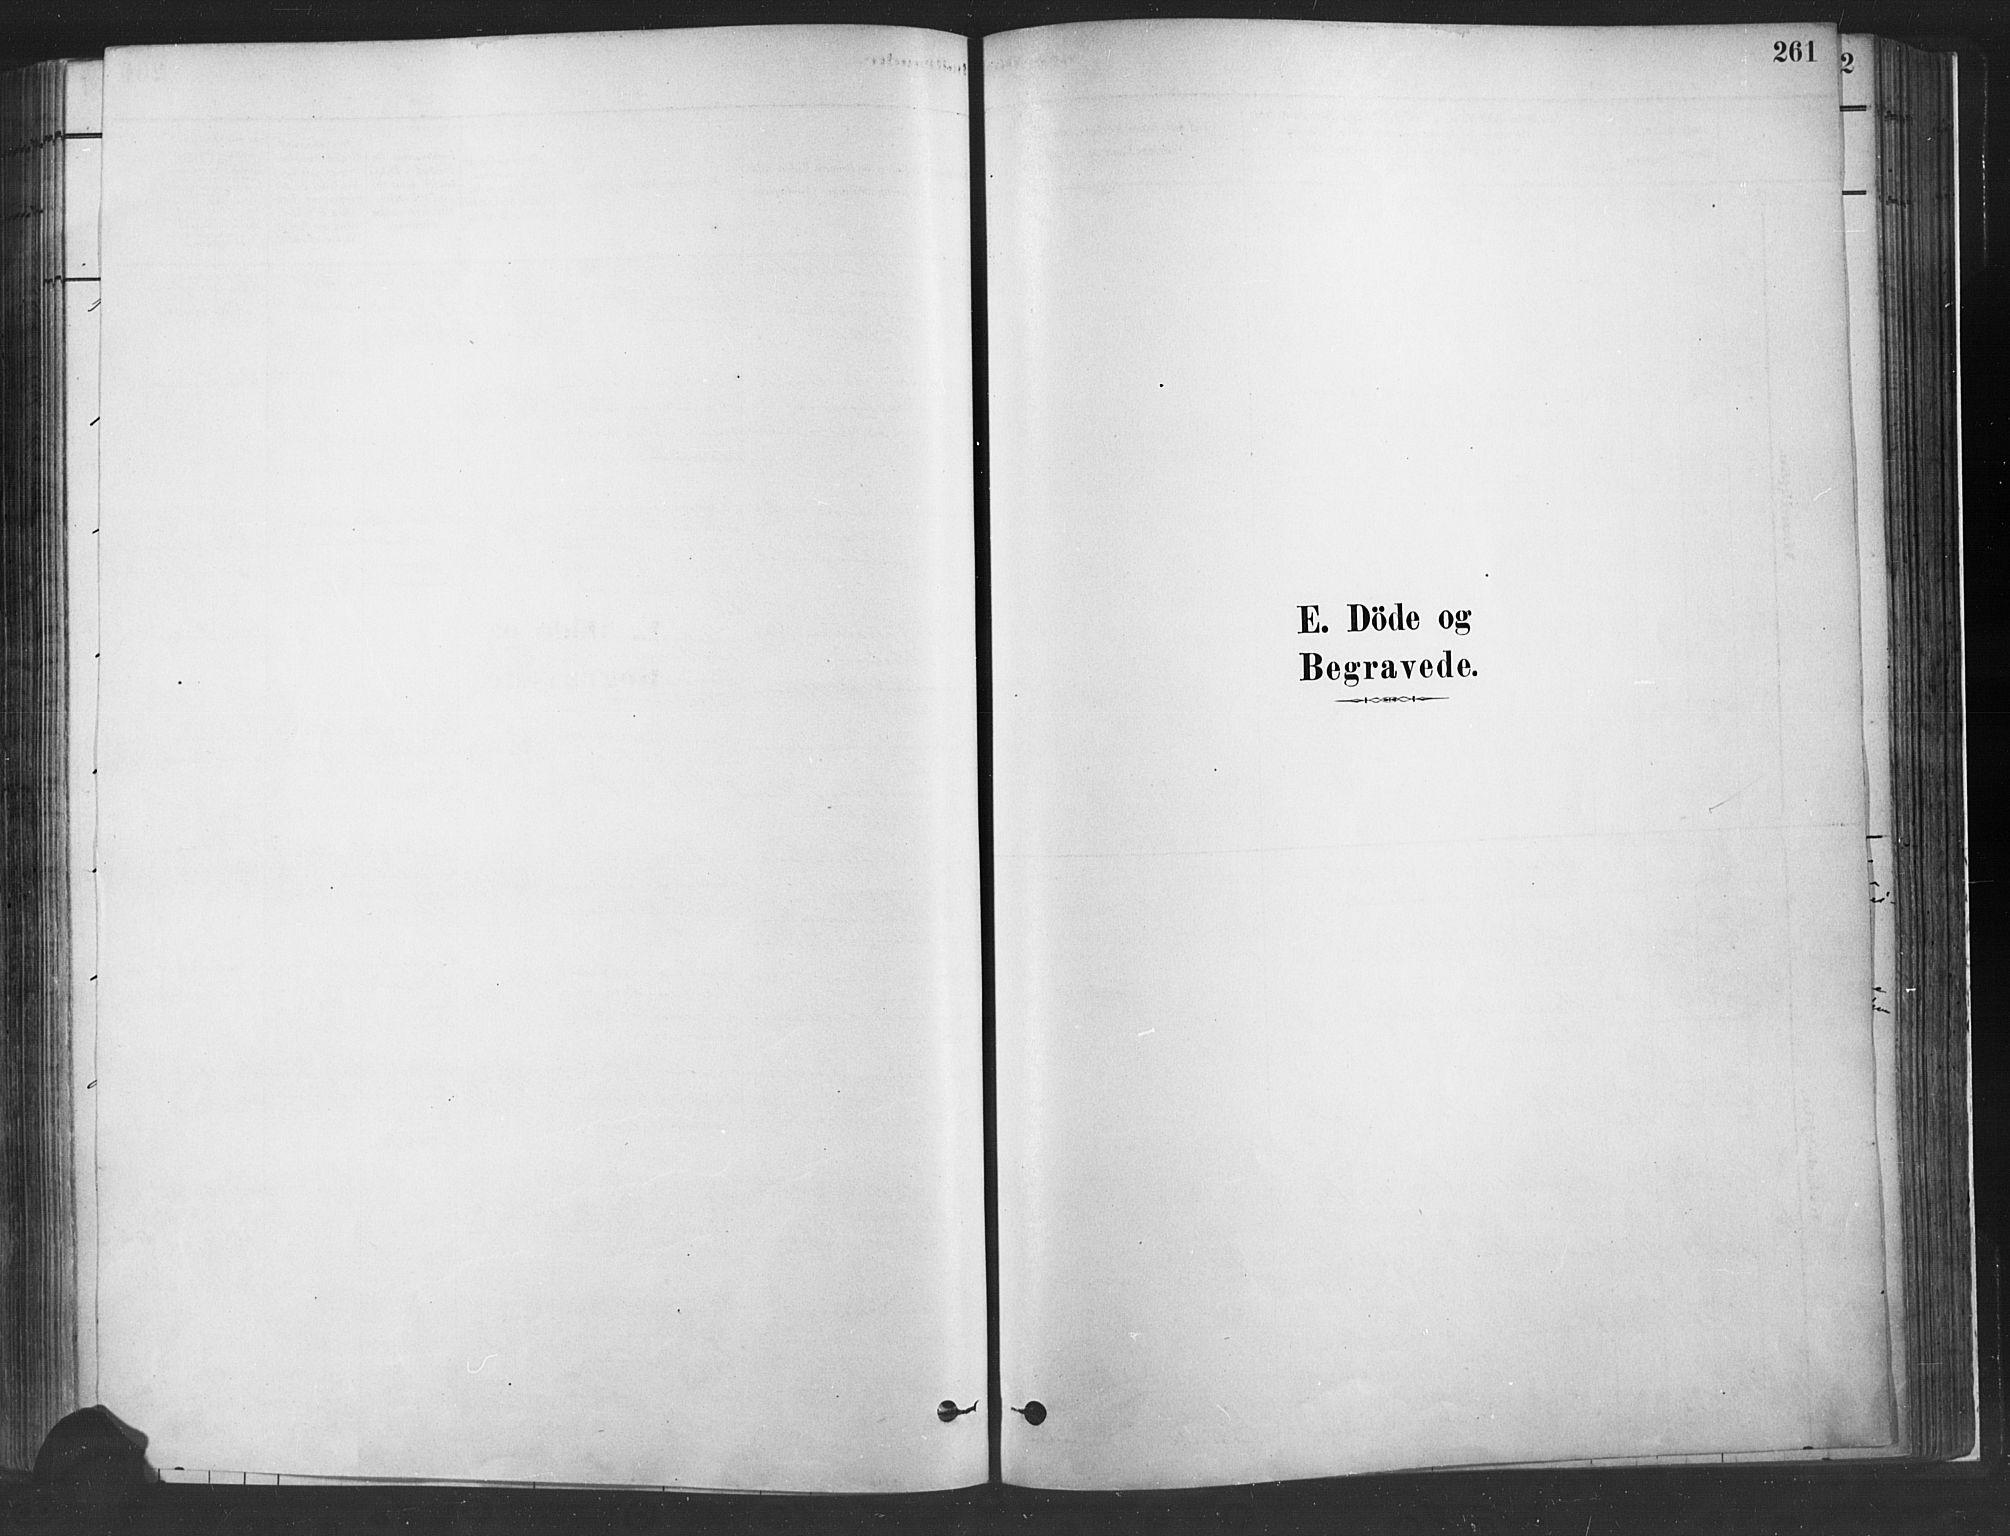 SAH, Fåberg prestekontor, Ministerialbok nr. 10, 1879-1900, s. 261